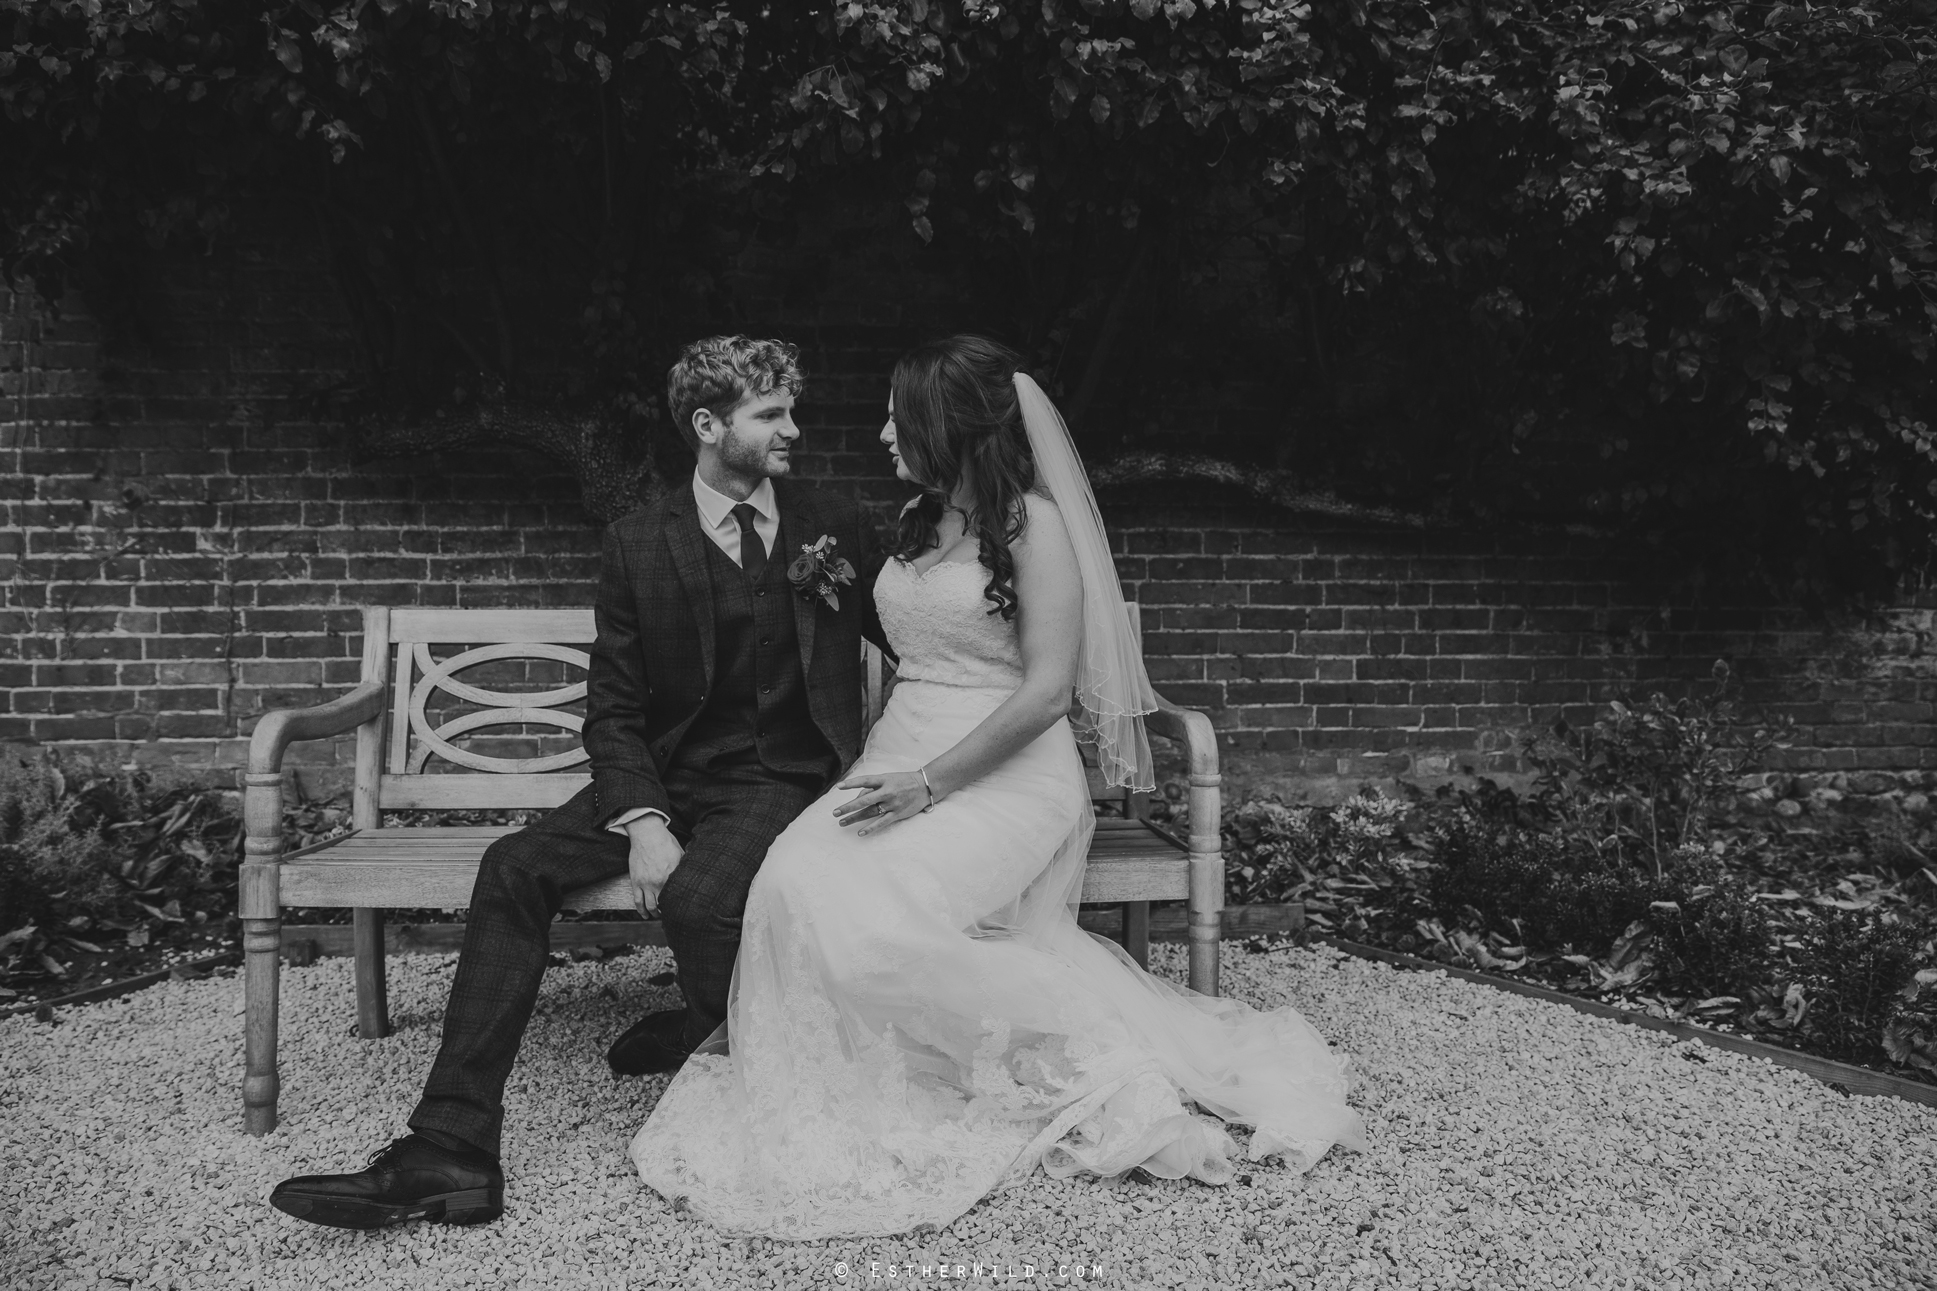 Reading_Room_Weddings_Alby_Norwich_Photographer_Esther_Wild_IMG_1712-1.jpg